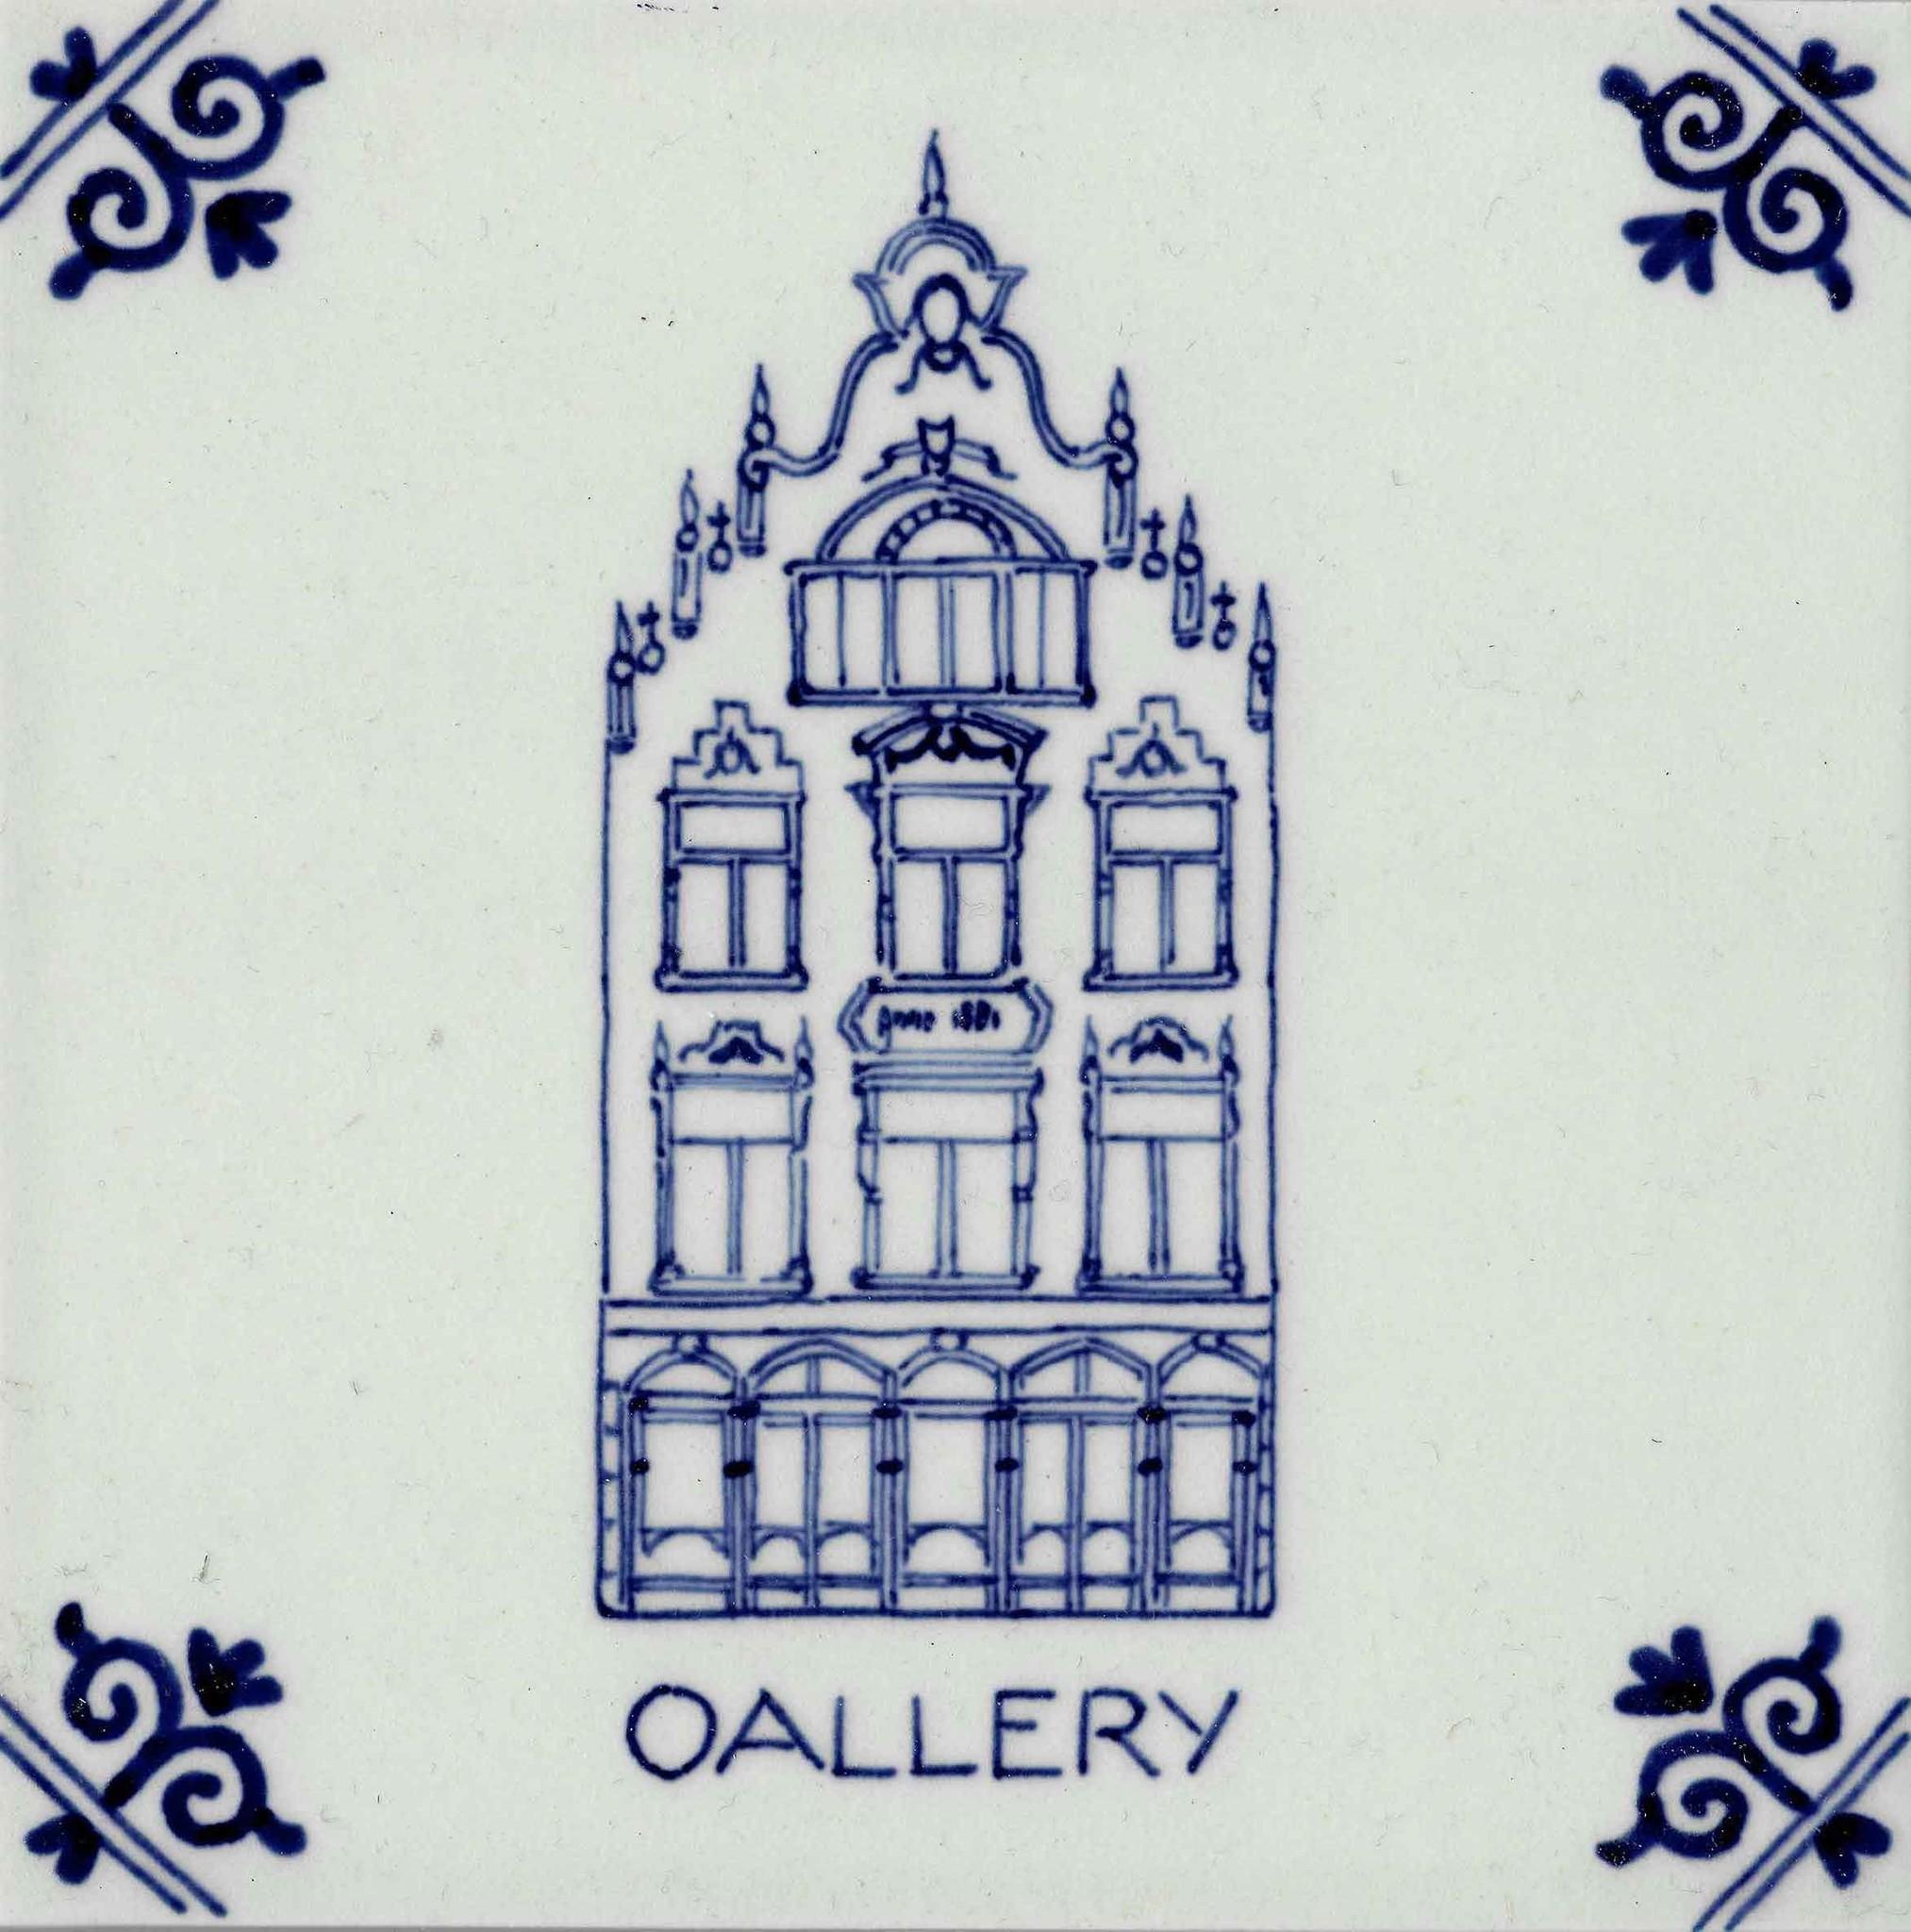 OALLERY Delfts Blue tile